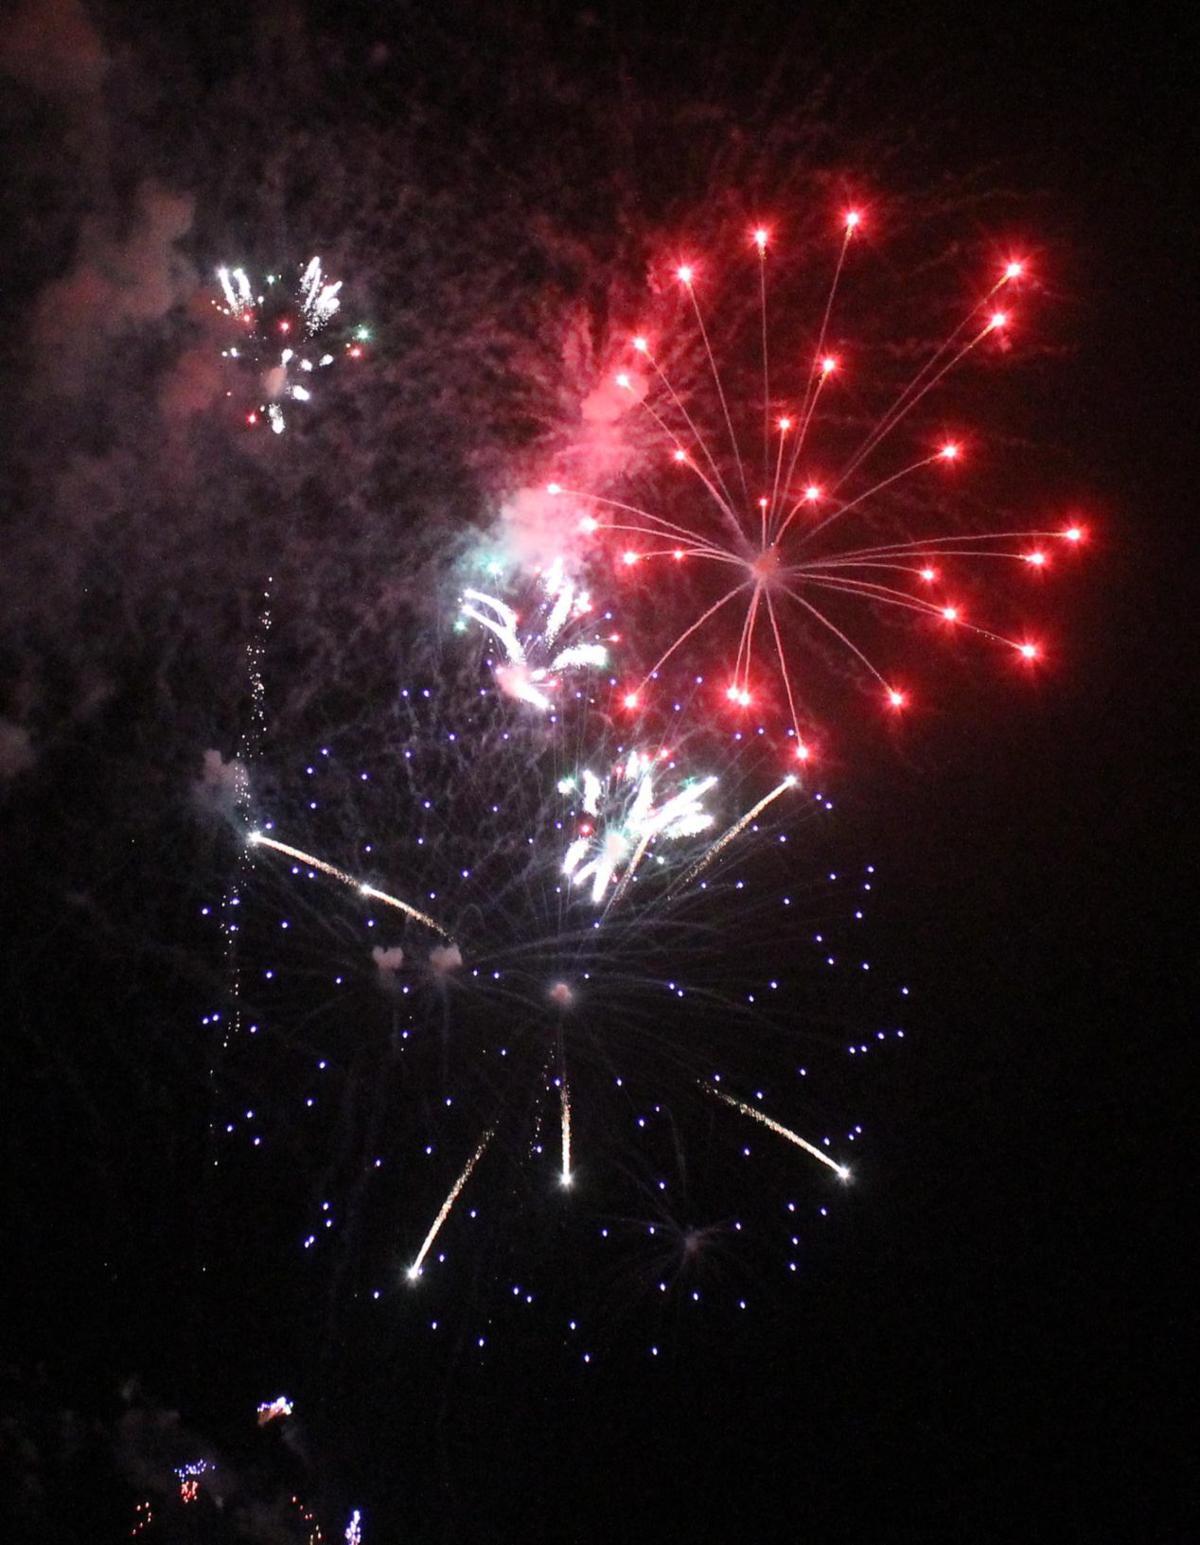 090119_chd_fireworks11.jpg